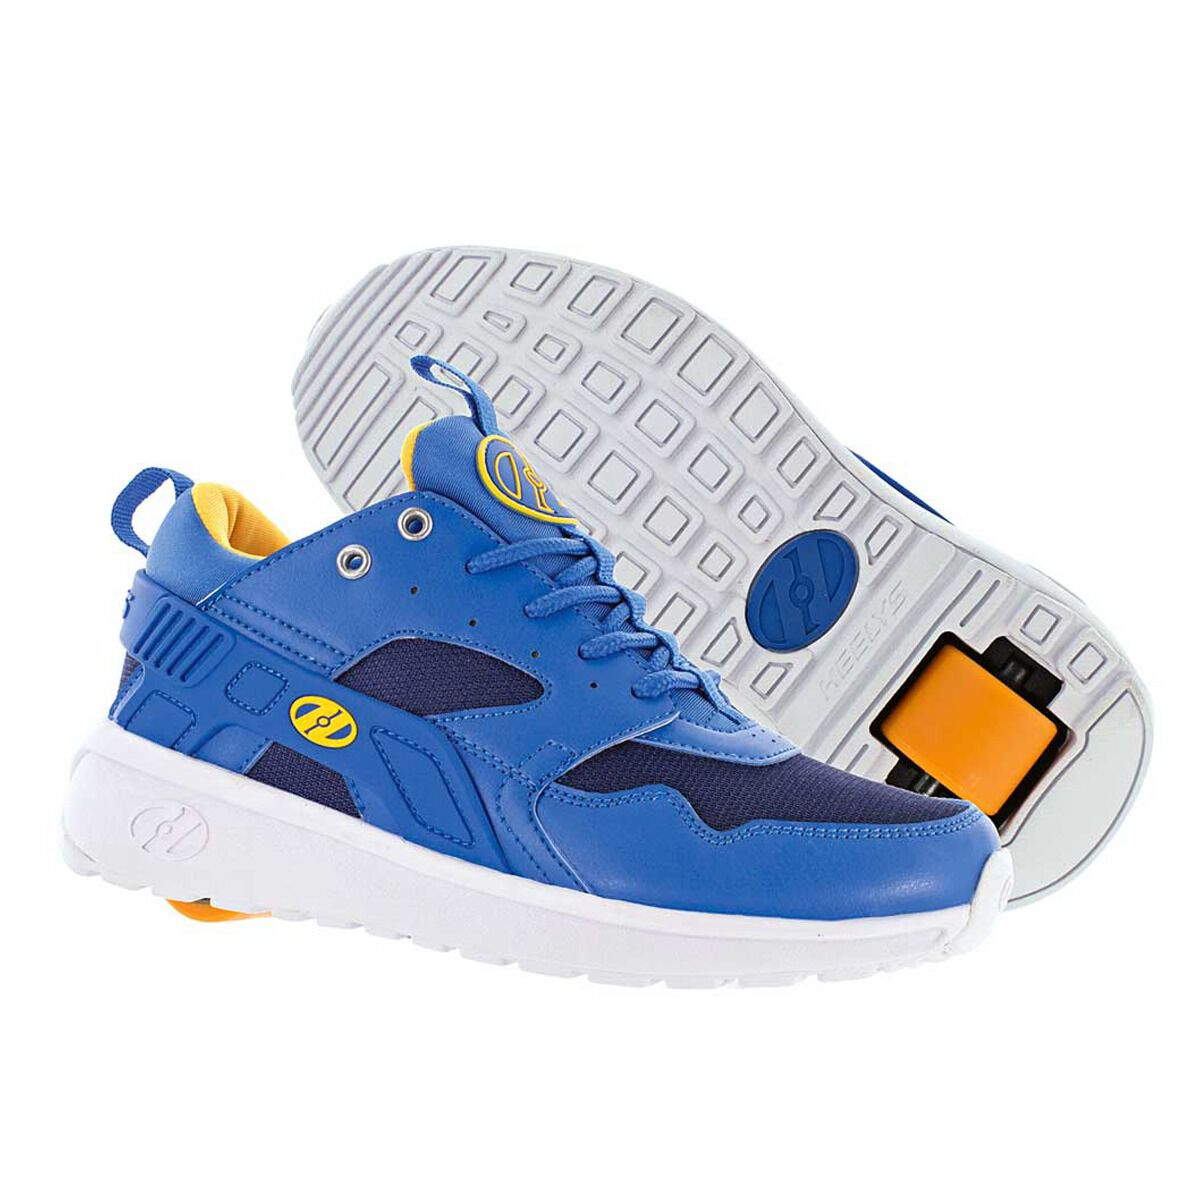 Heelys Force Boys Shoes | Rebel Sport